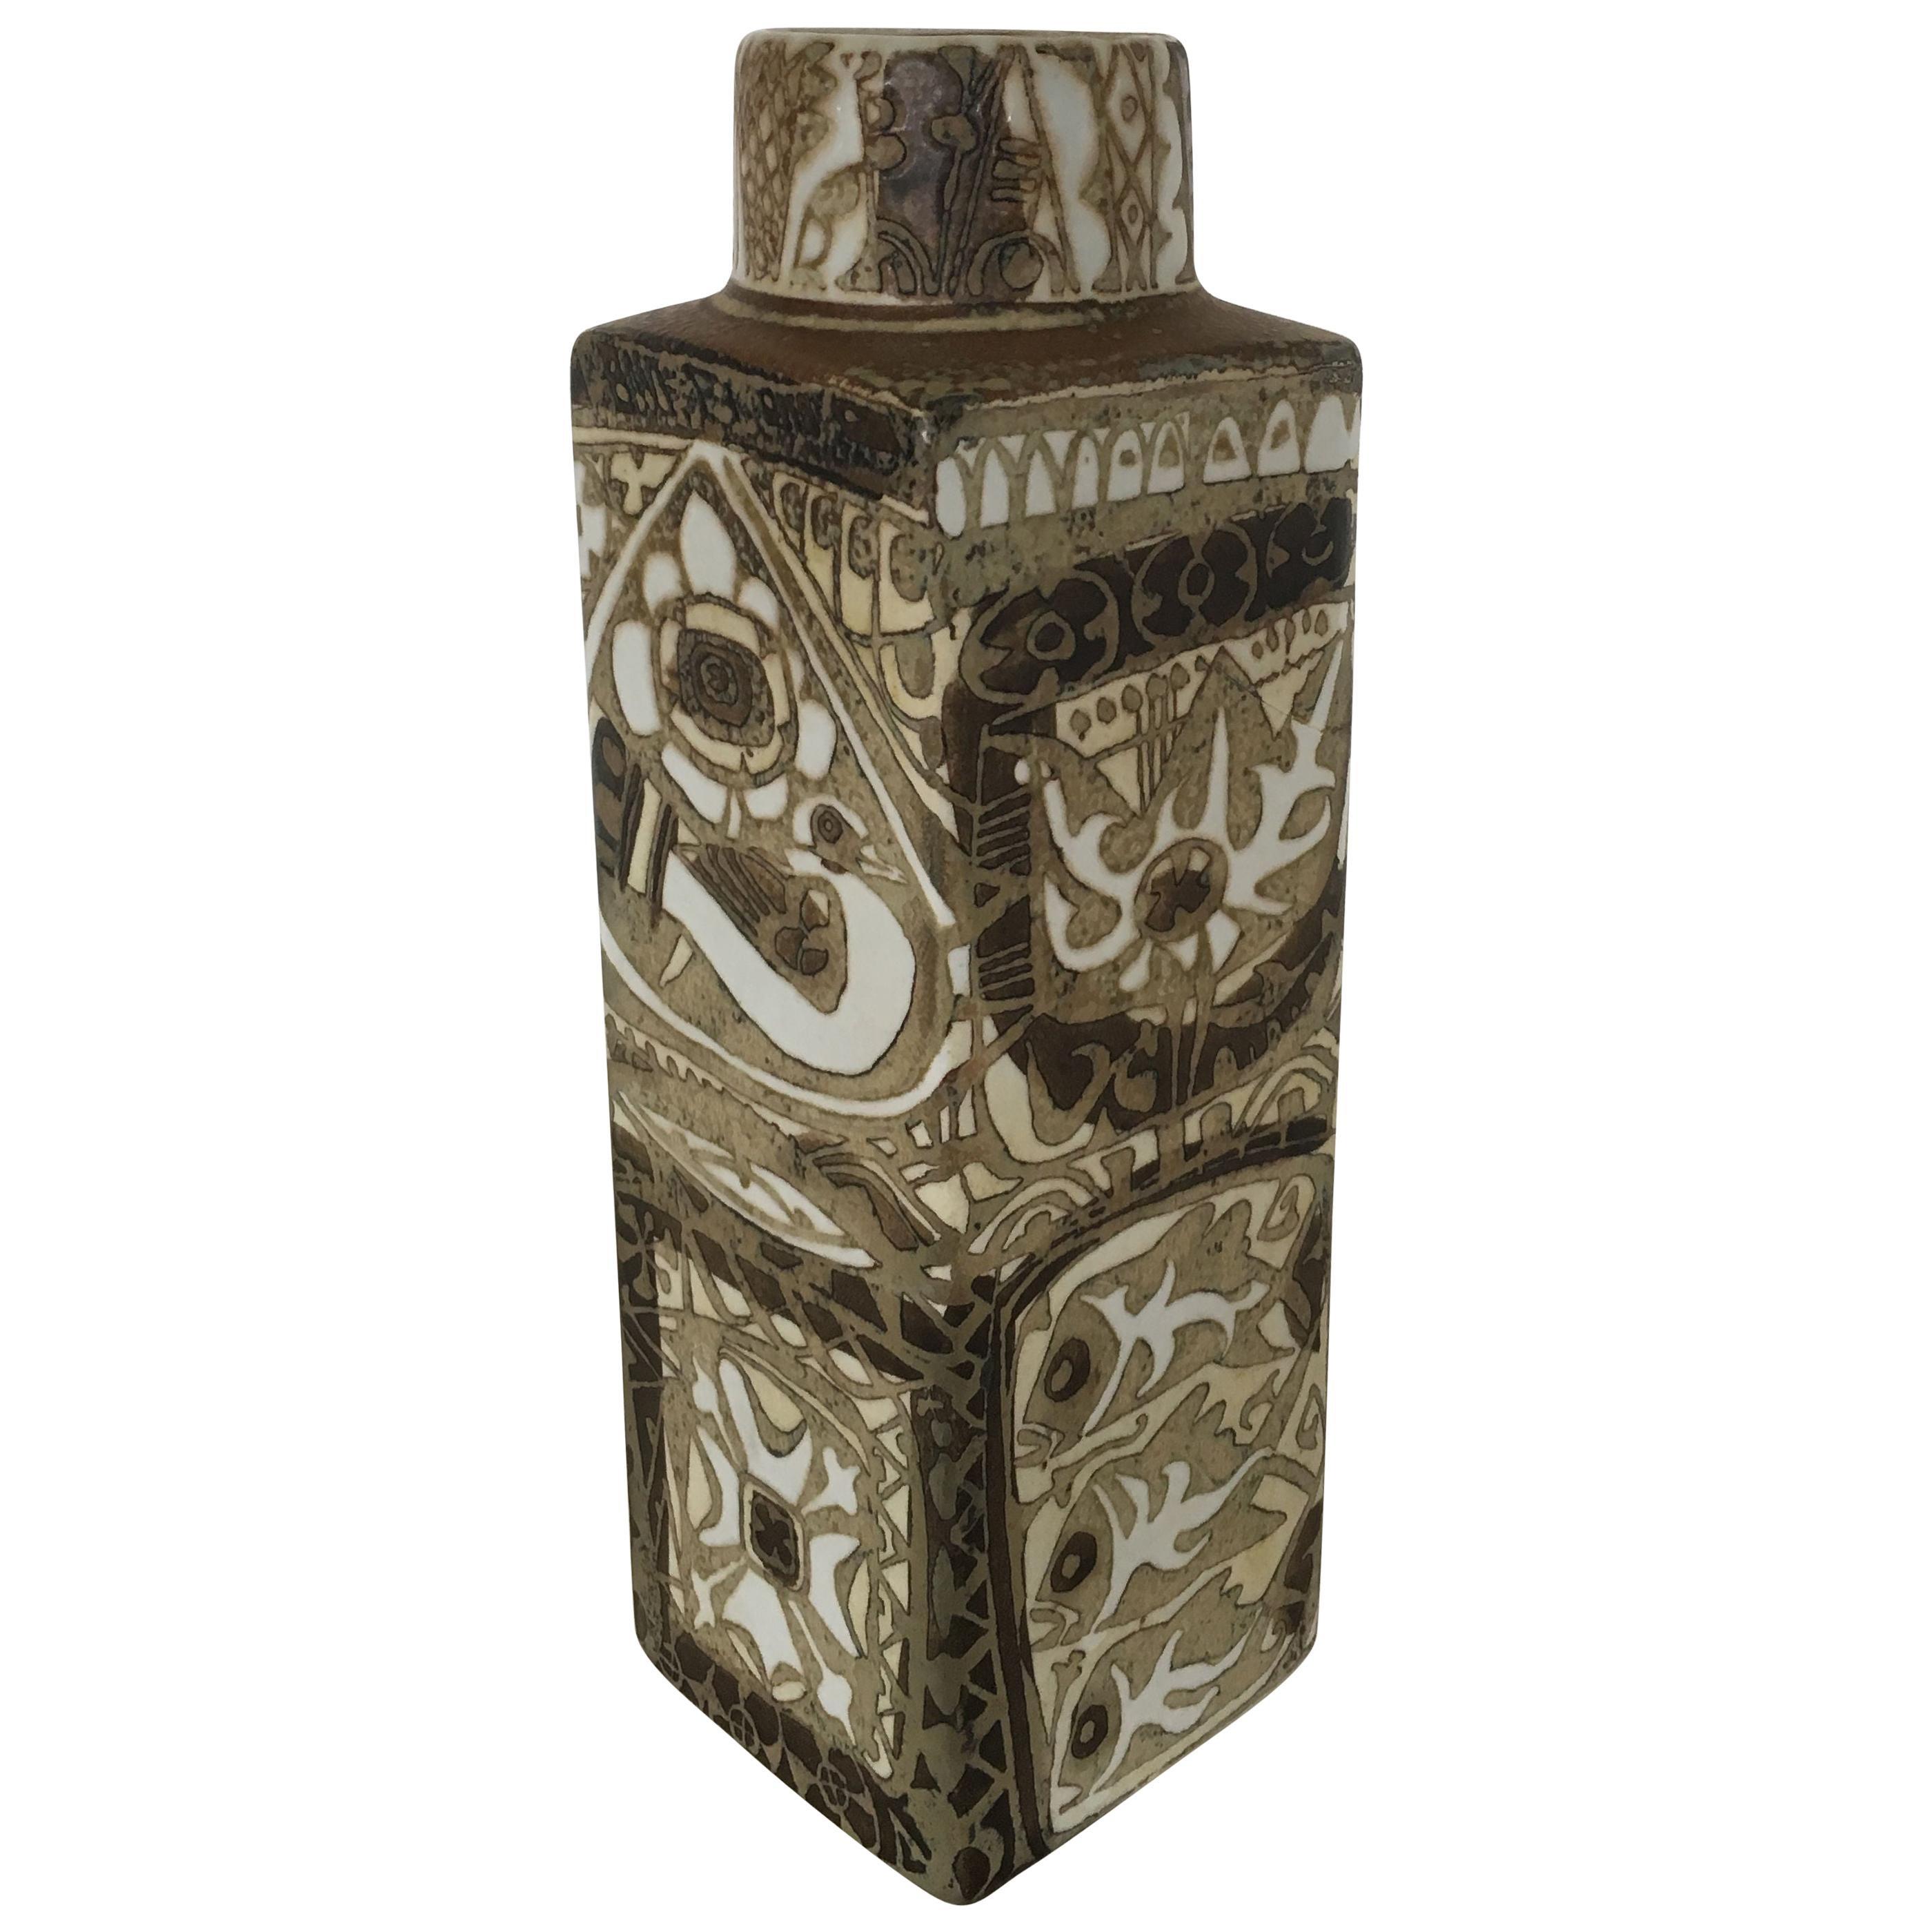 Nils Thorsson Danish Faience Glazed Baca Vase by Royal Copenhagen